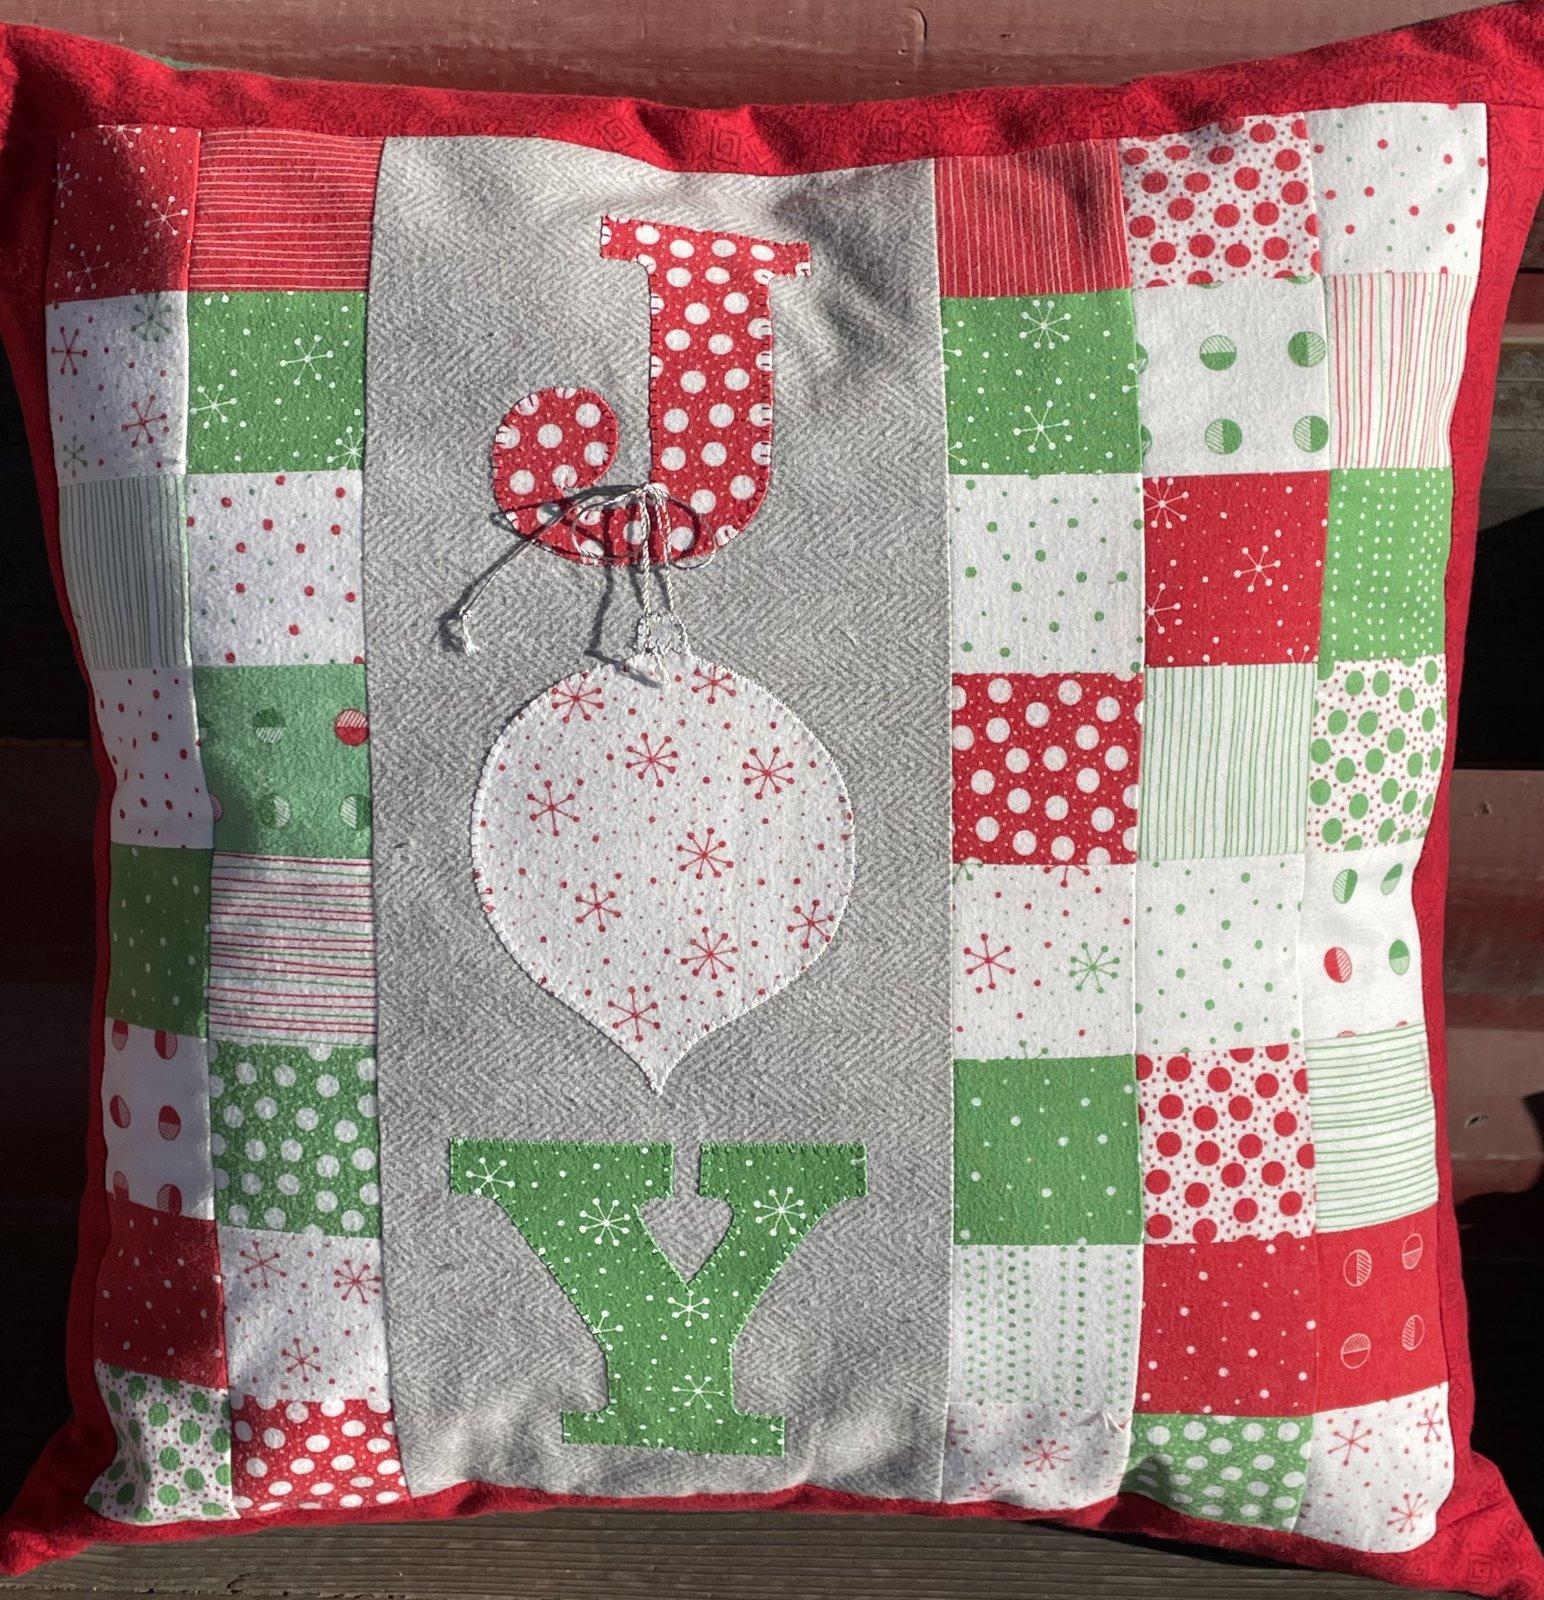 Holiday Charm Pillow Kits